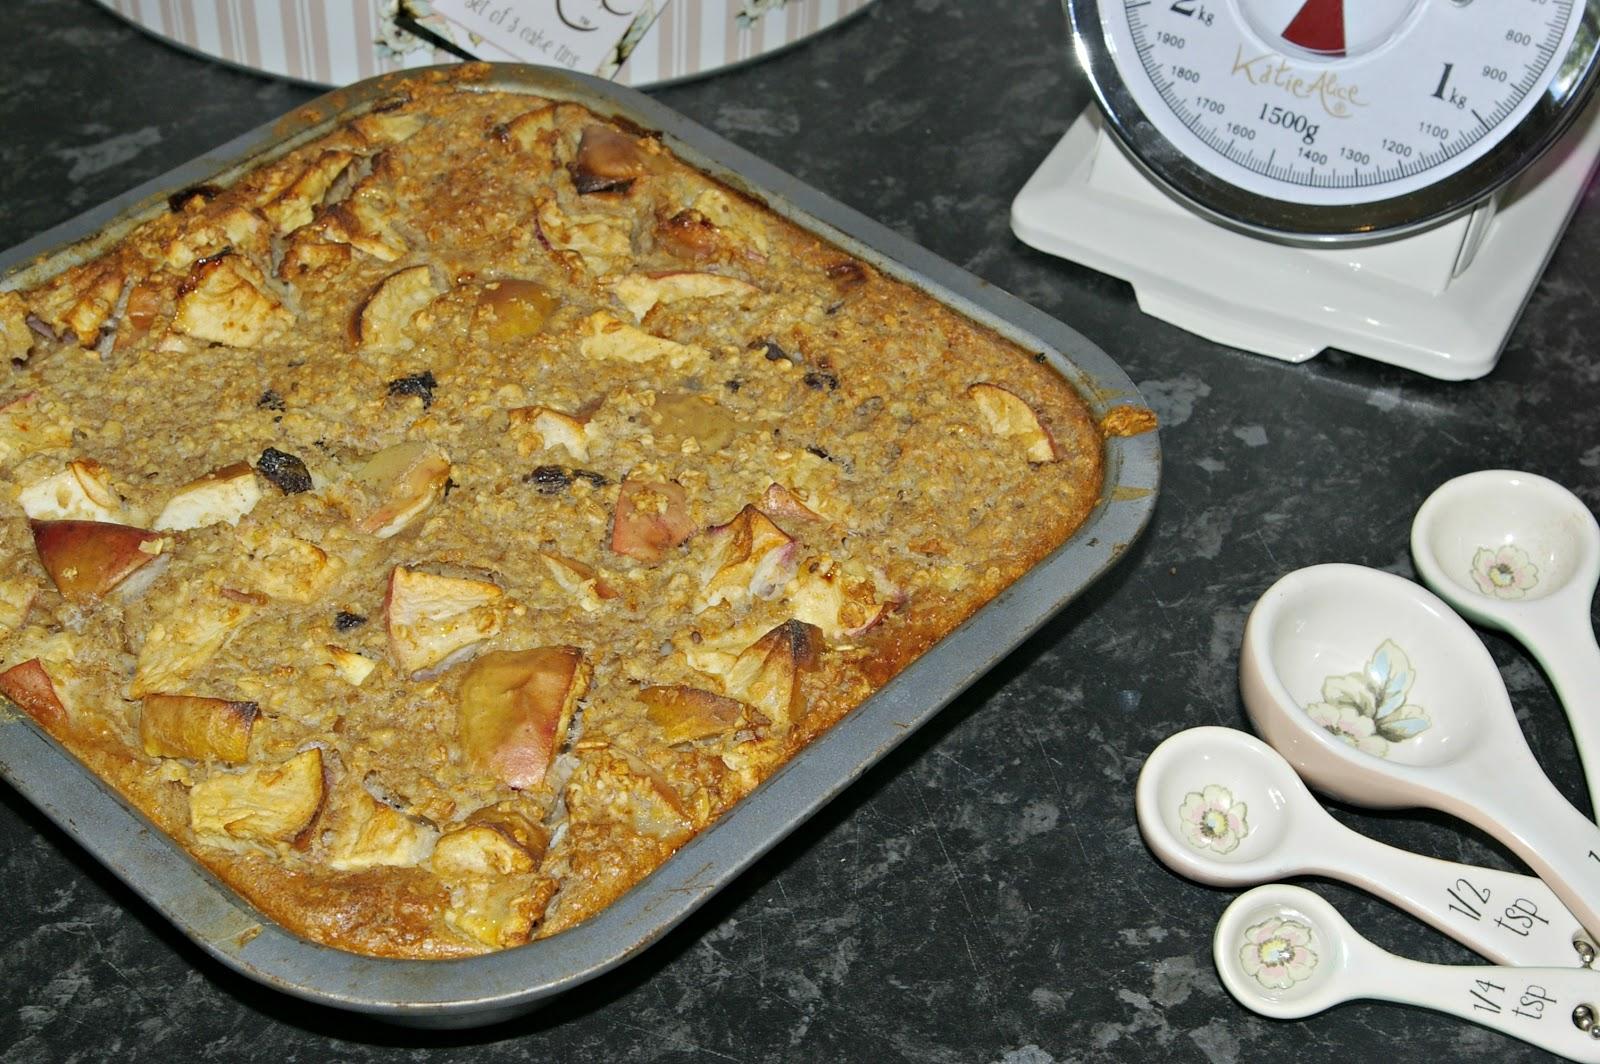 'Clean' Apple, Cinnamon & Raisin bake